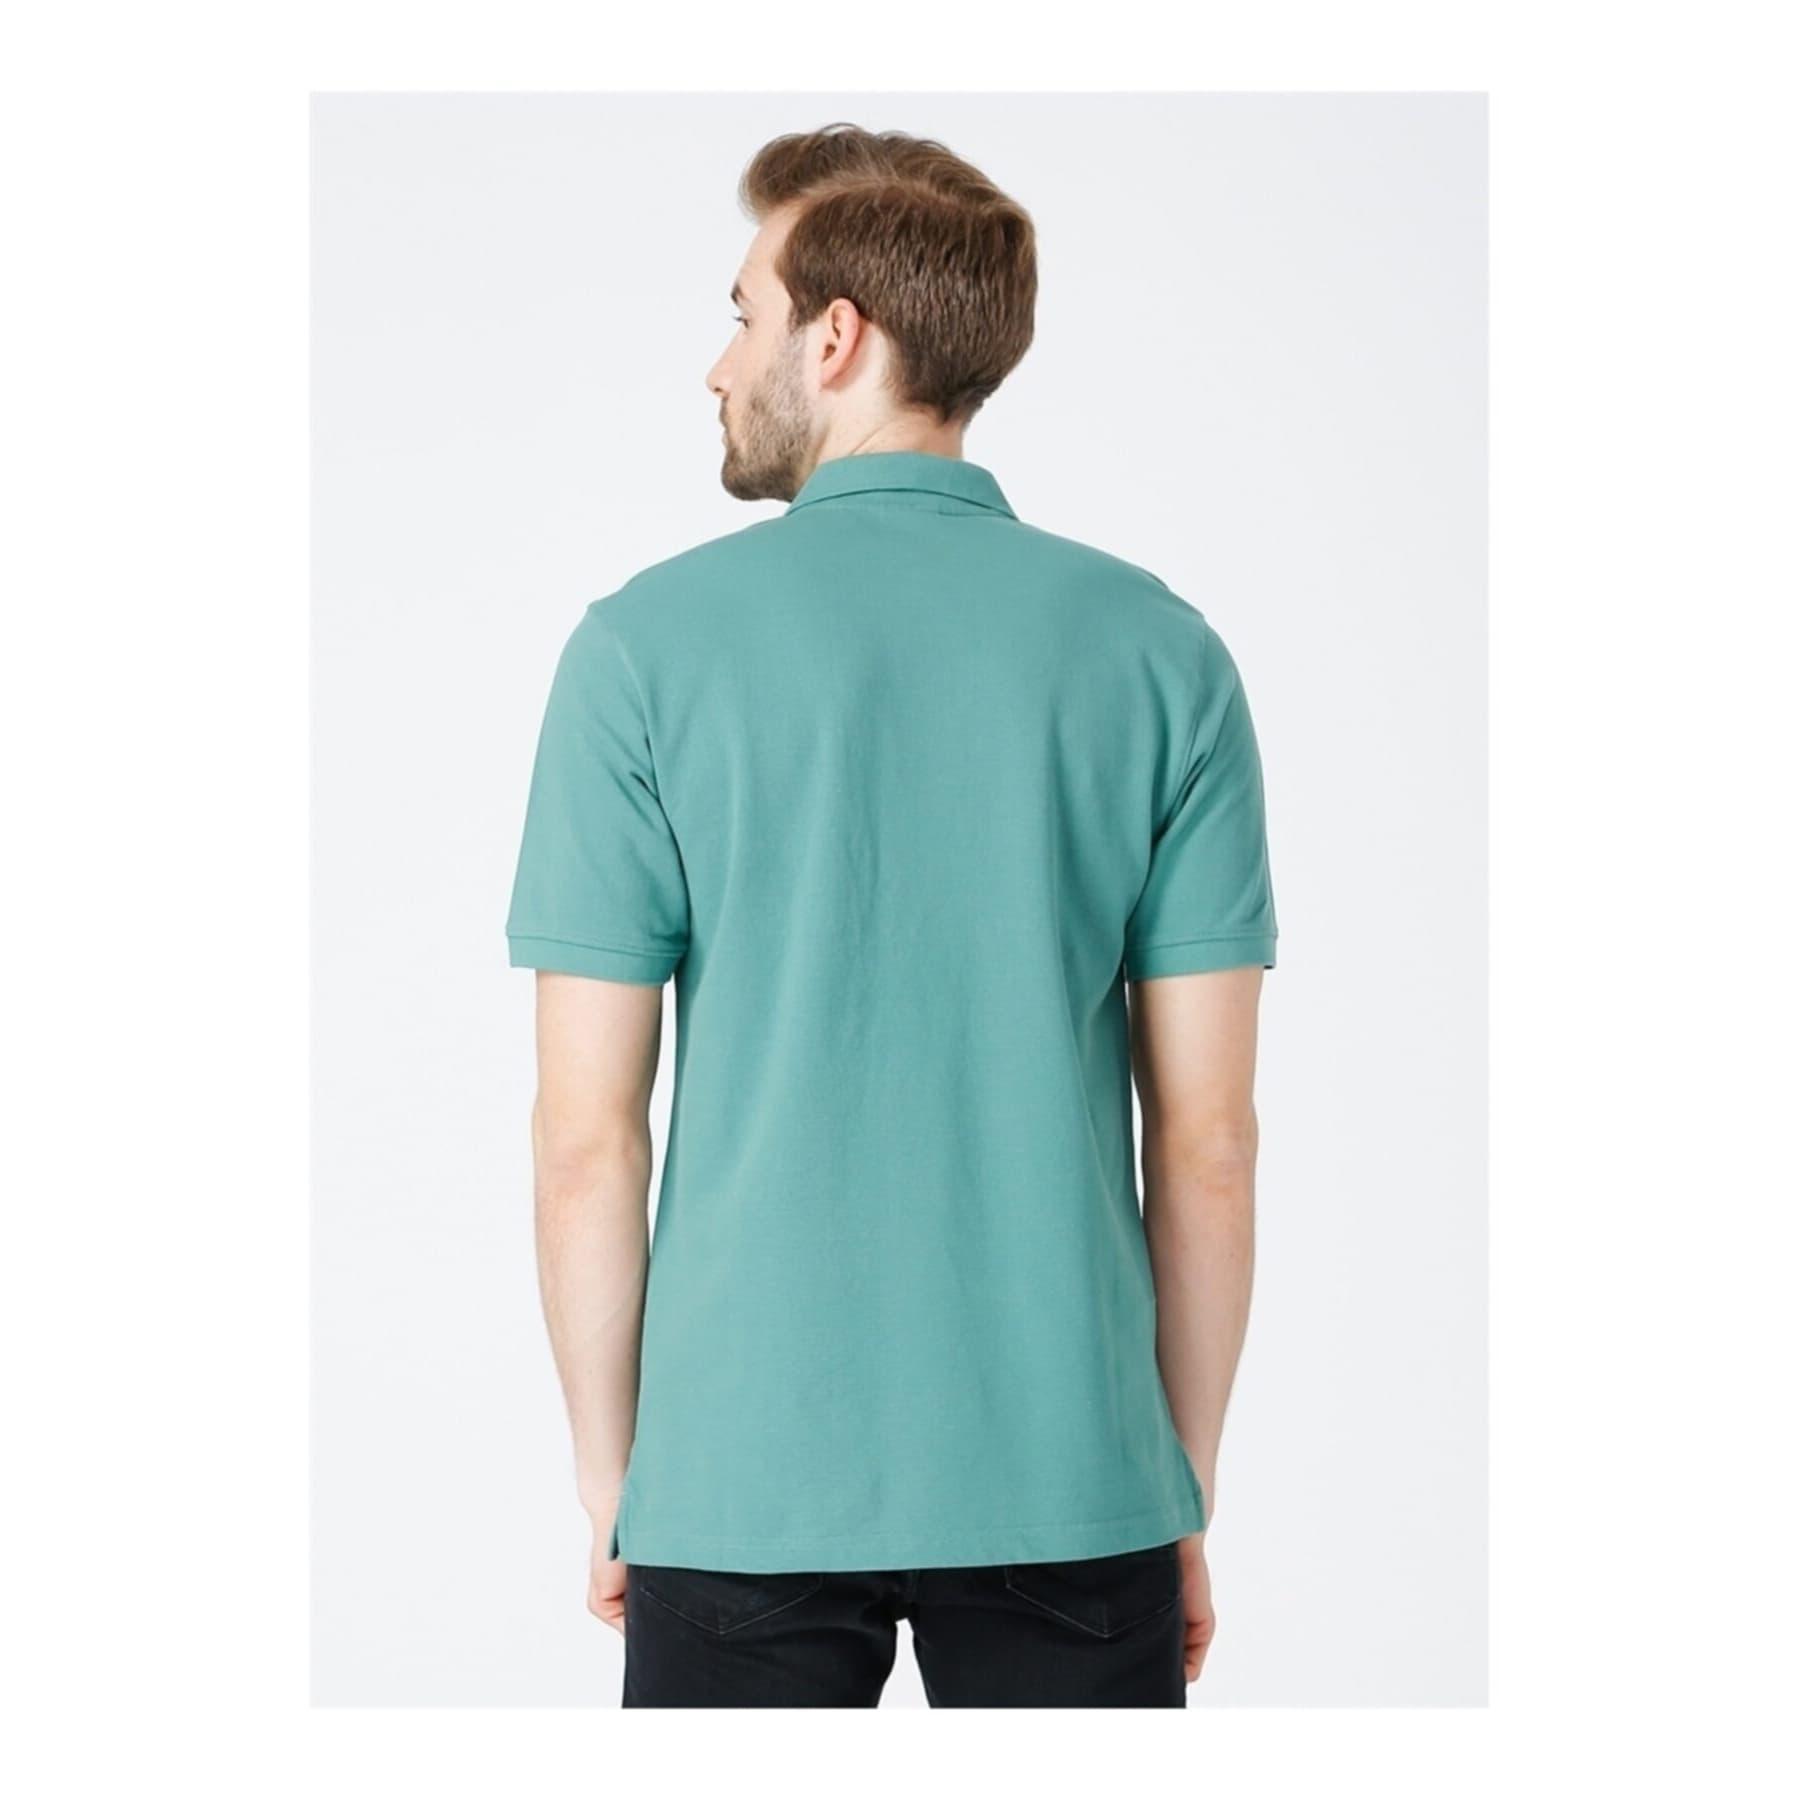 Cascade Range II Erkek Yeşil Tişört (CS0214-369)